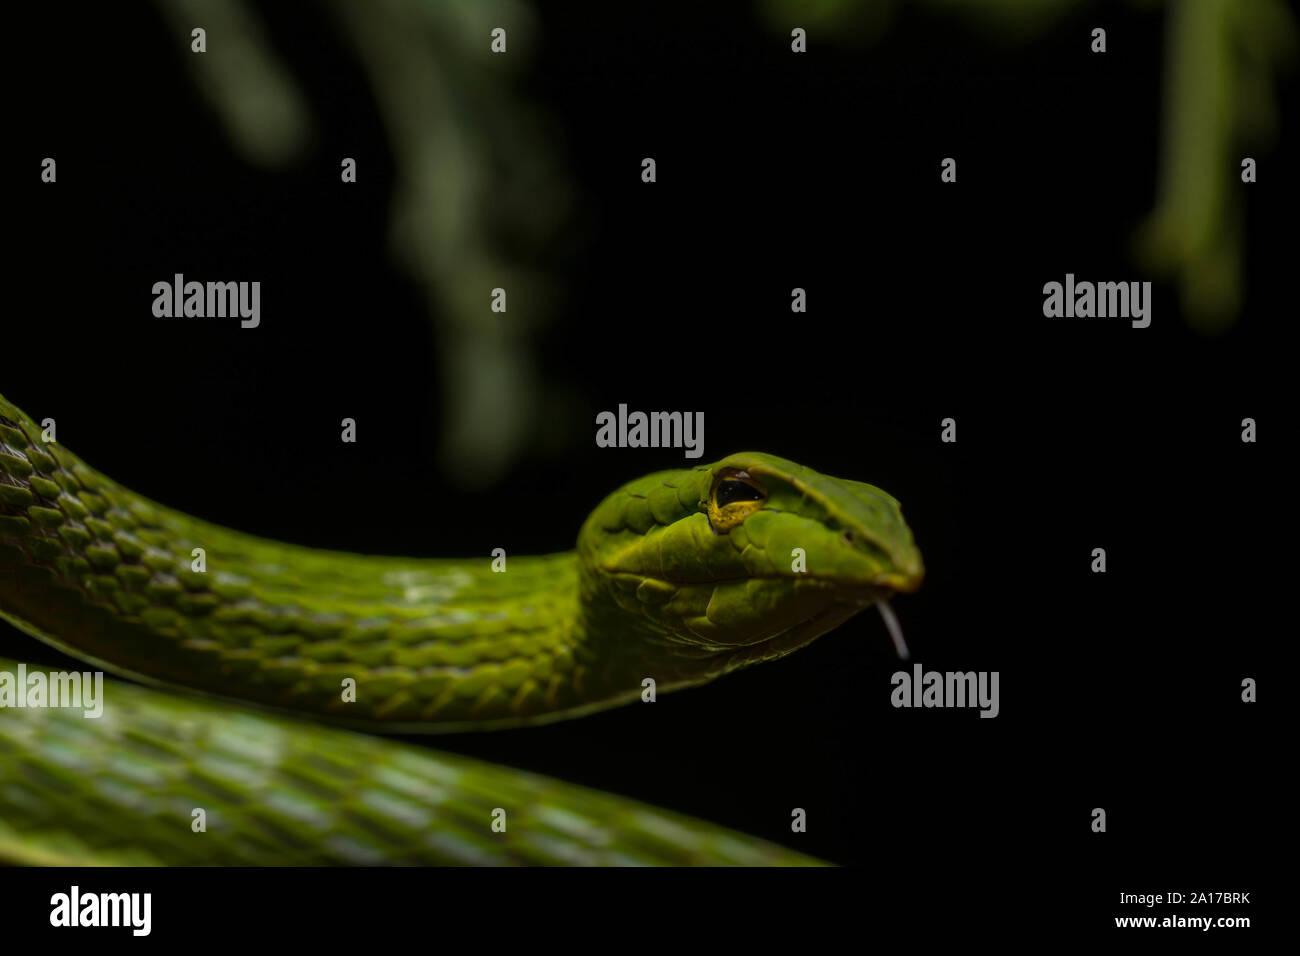 De hocico largo (Whipsnake Ahaetulla nasuta) de la provincia de Prachuap Khiri Khan, Tailandia. Foto de stock